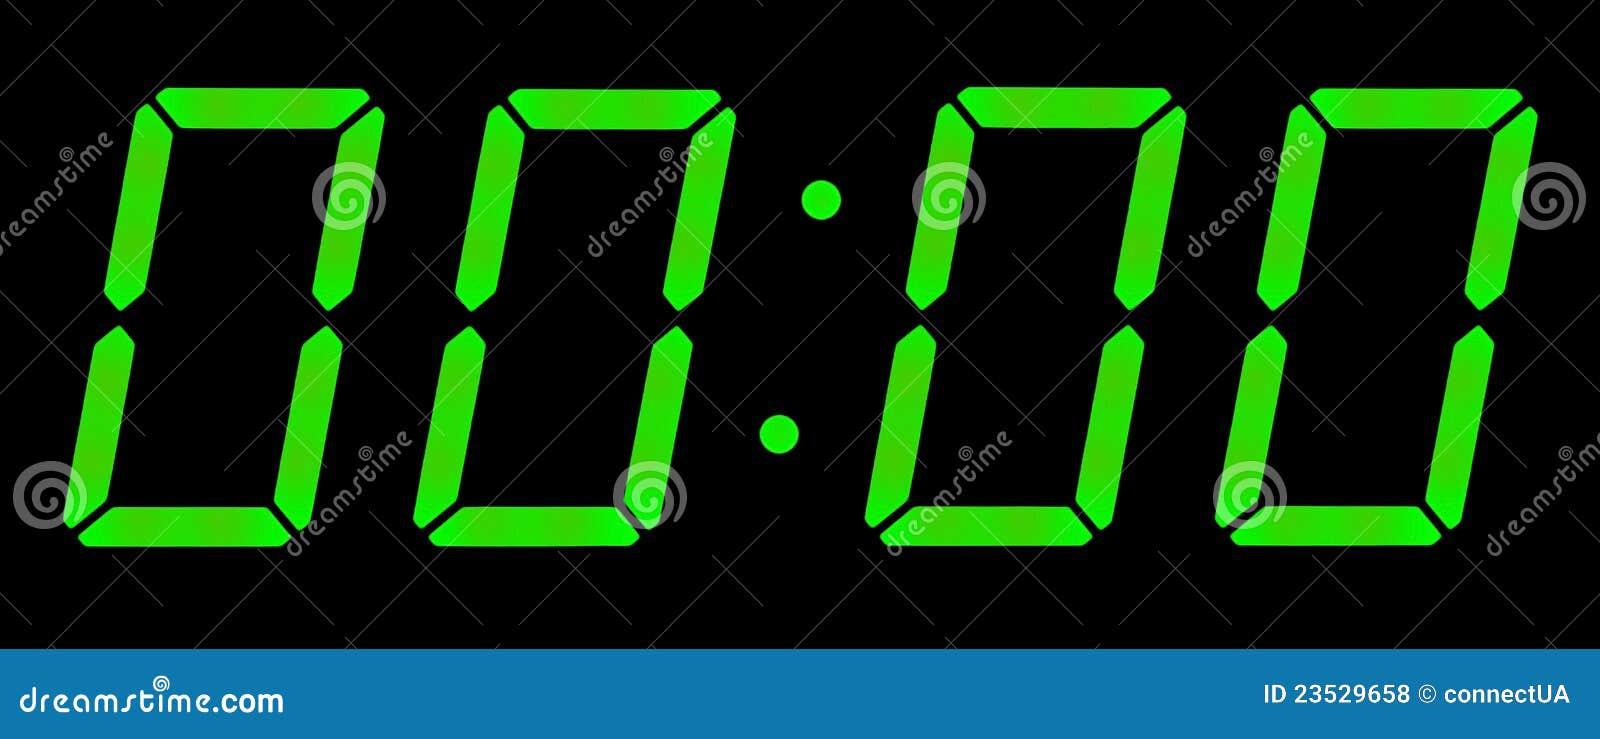 Digital clock show zero hours zero minutes. Isolated on the black ...